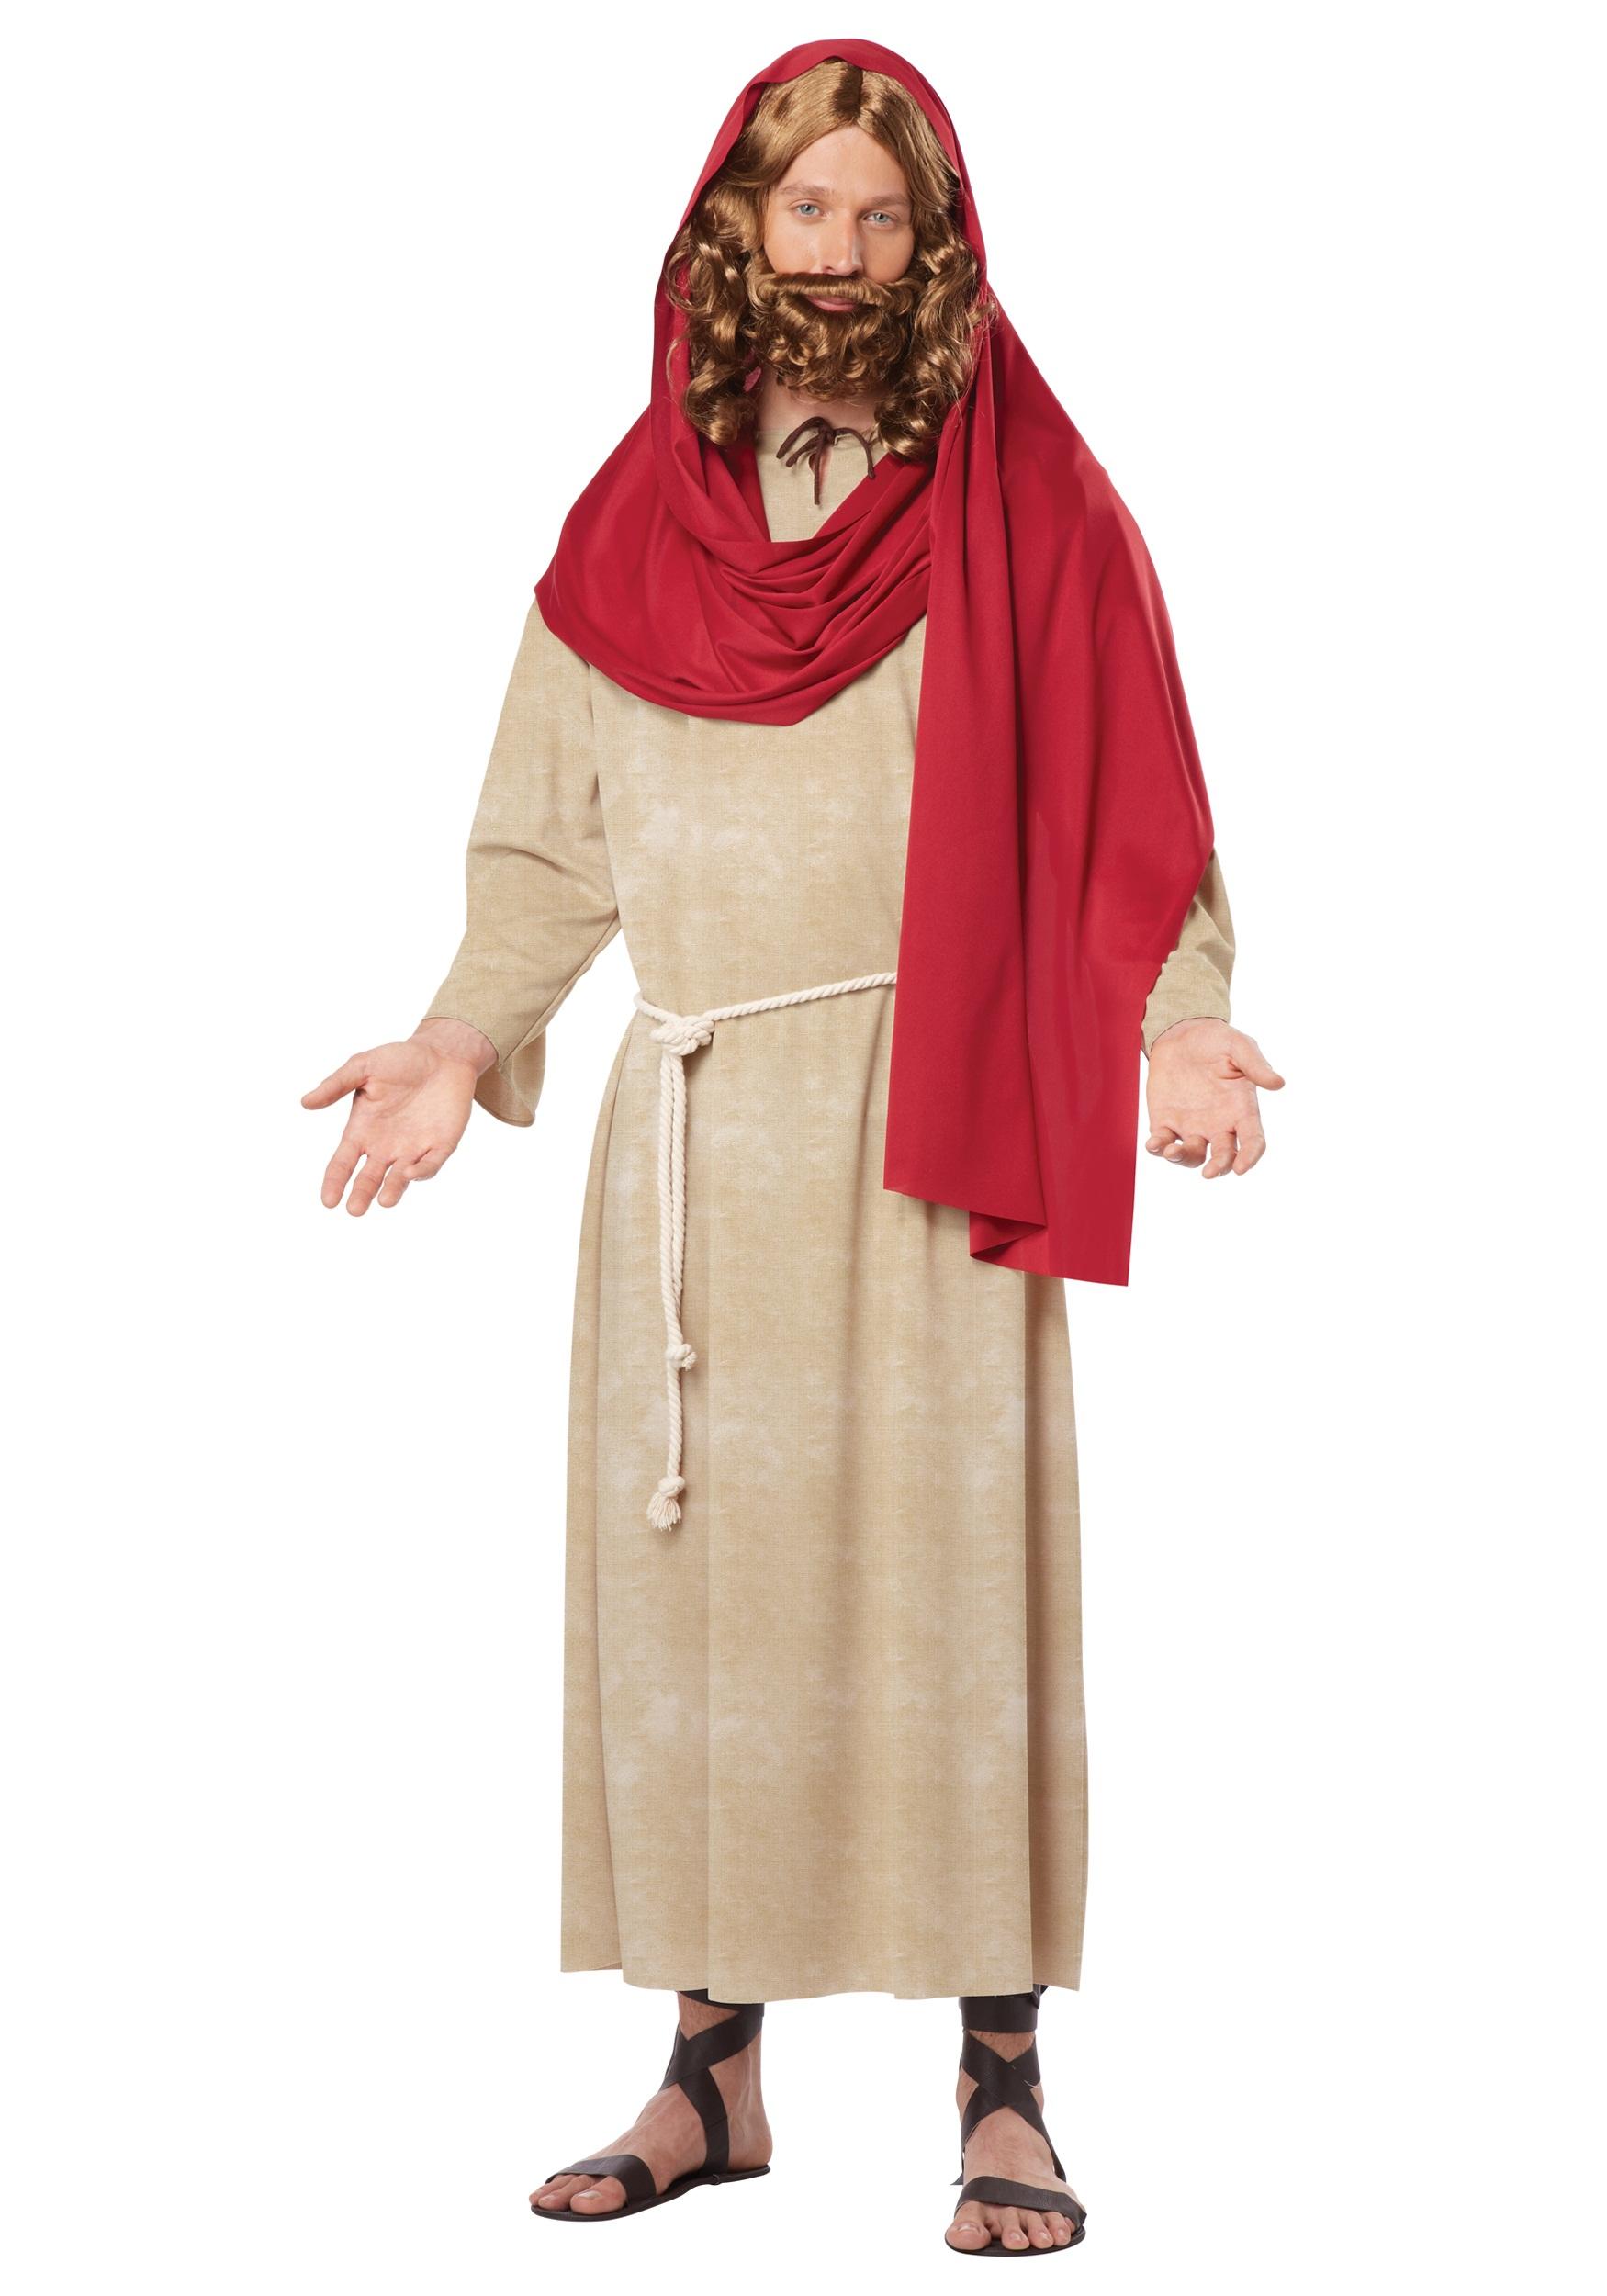 Jesus Christ Adult Costume